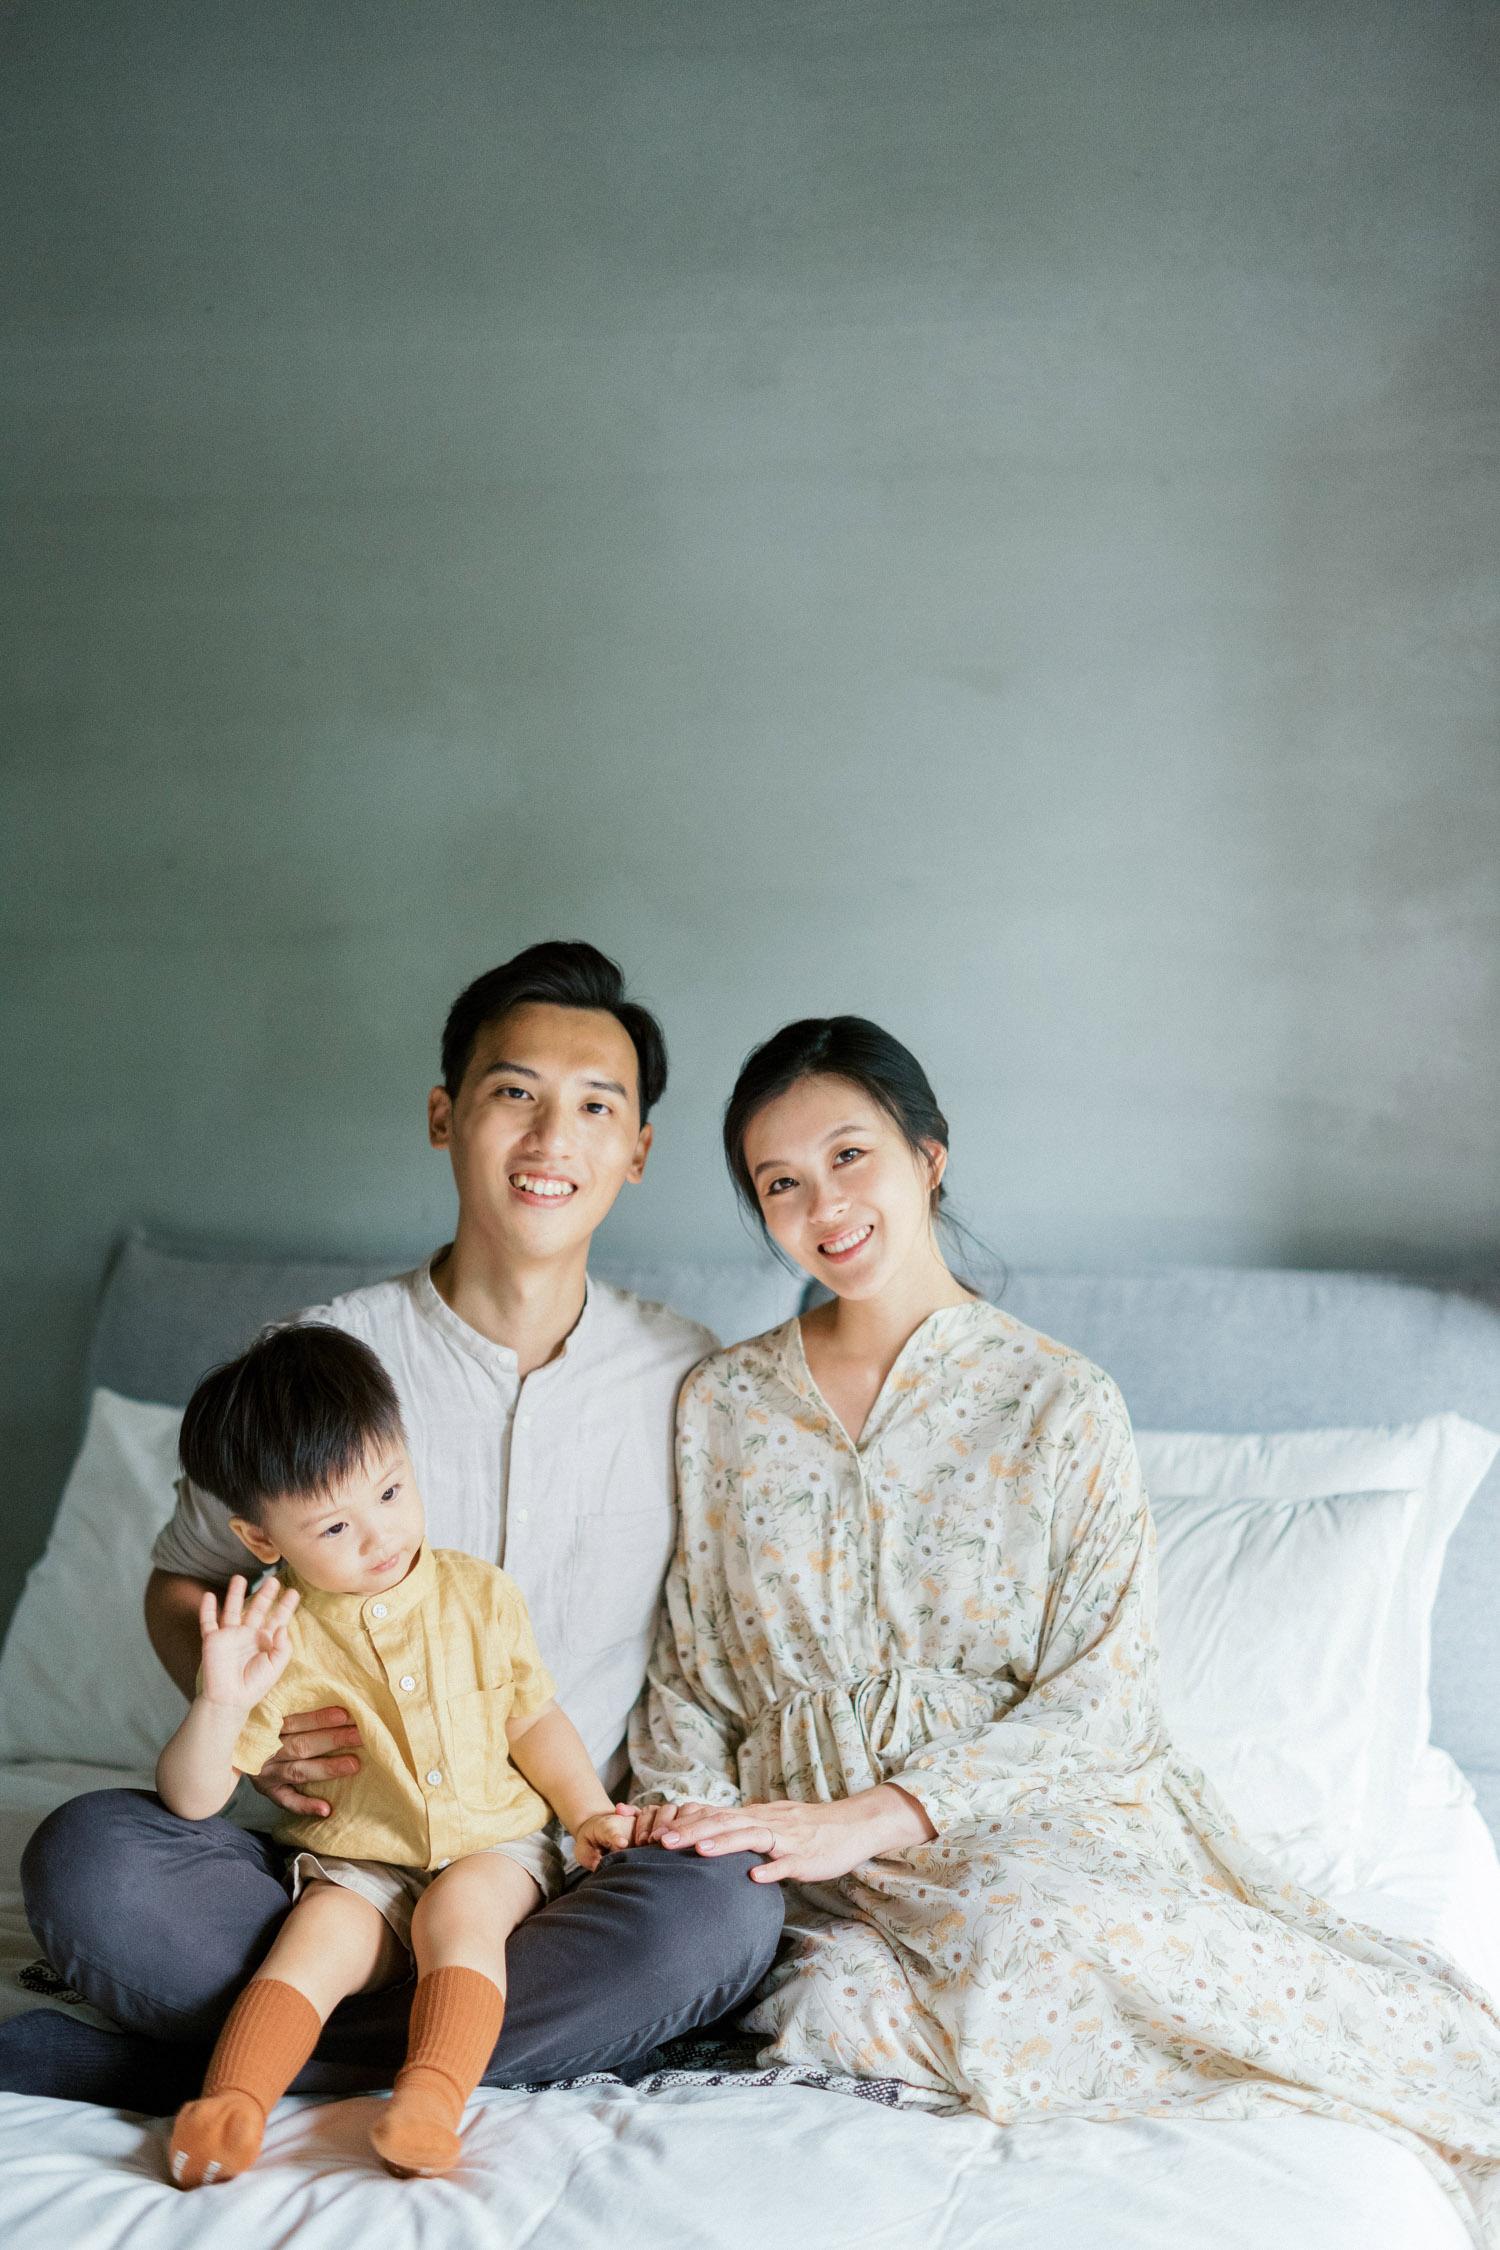 全家福-孕期寫真-孕婦寫真-底片-GFX 50R-STAGE-mark hong